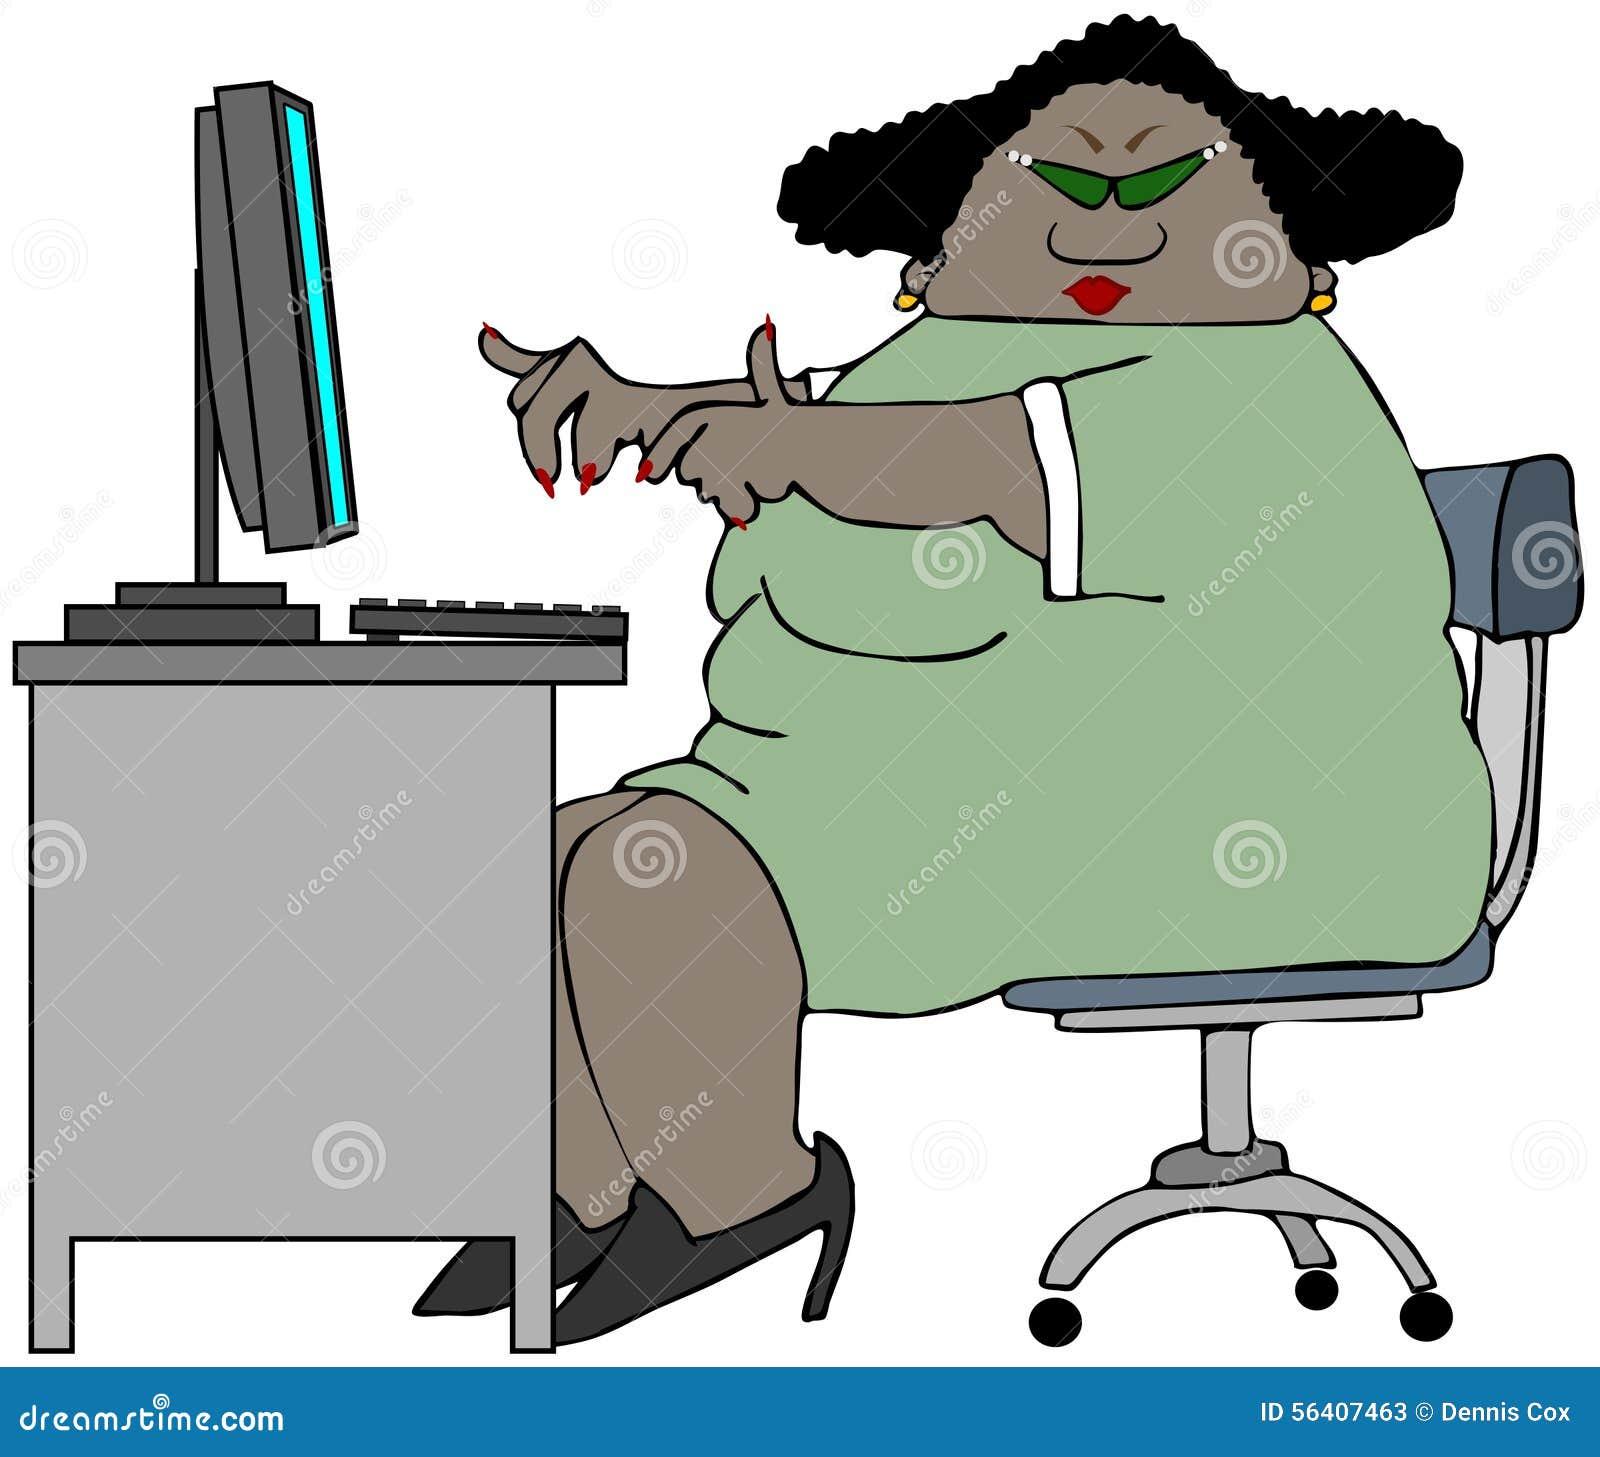 nude pics of chubby black girls